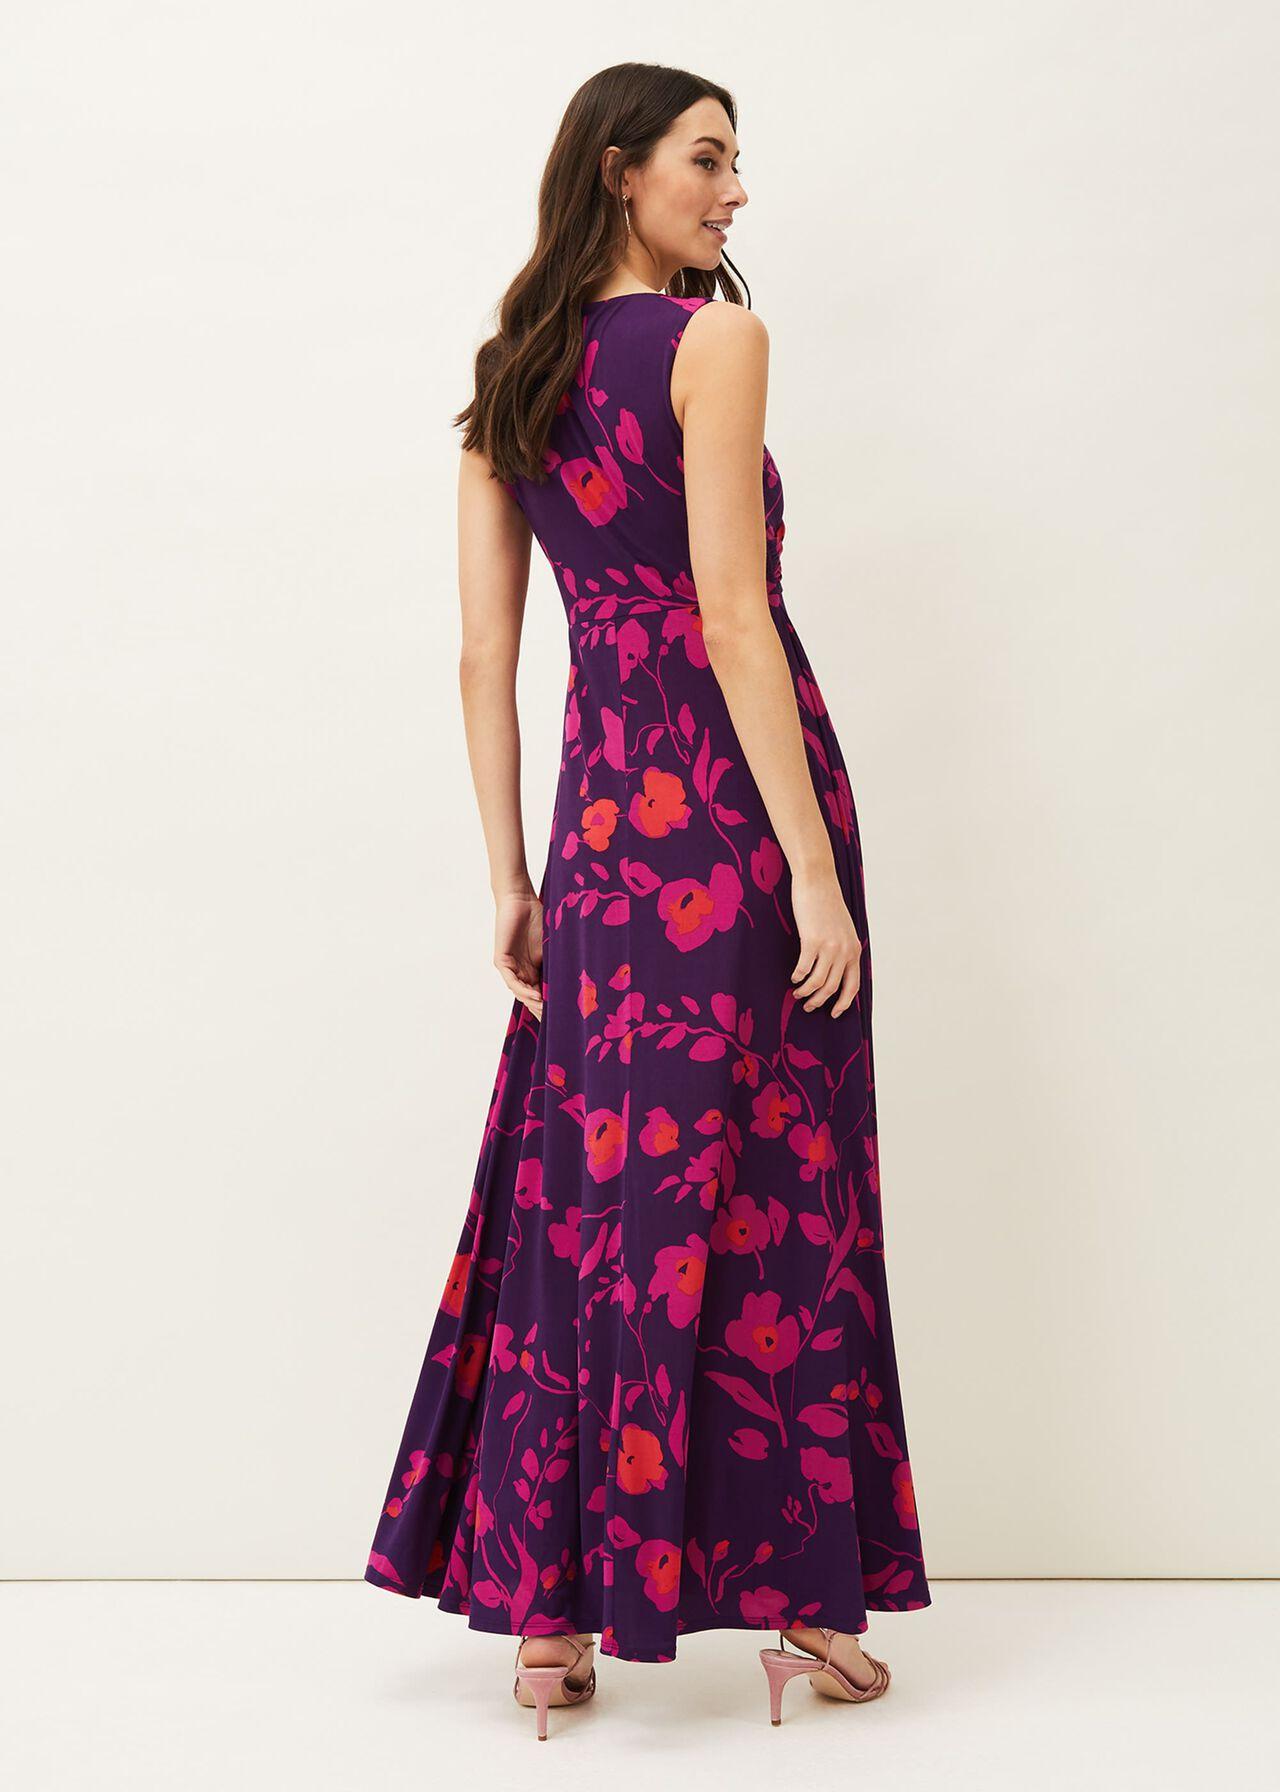 Isla Floral Sleeveless V-Neck Maxi Dress